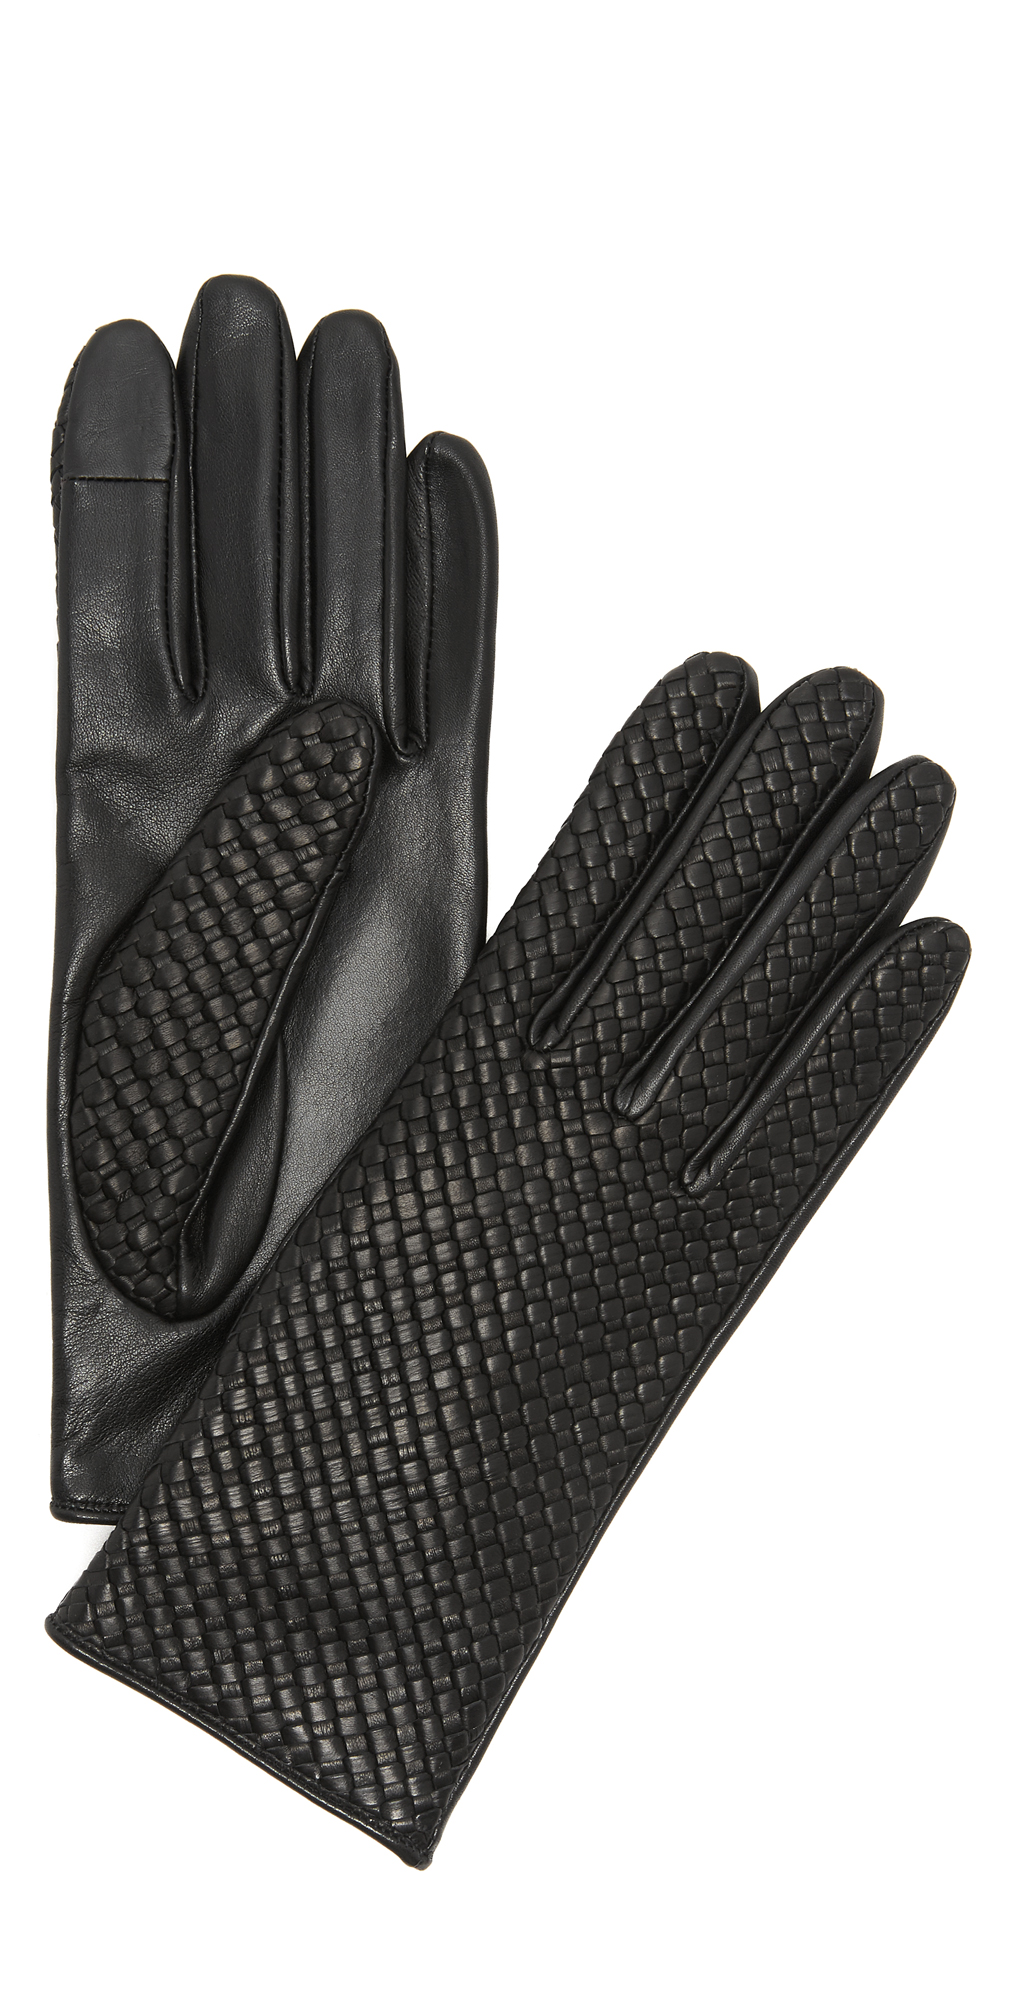 Agnelle Chletresse Texting Gloves